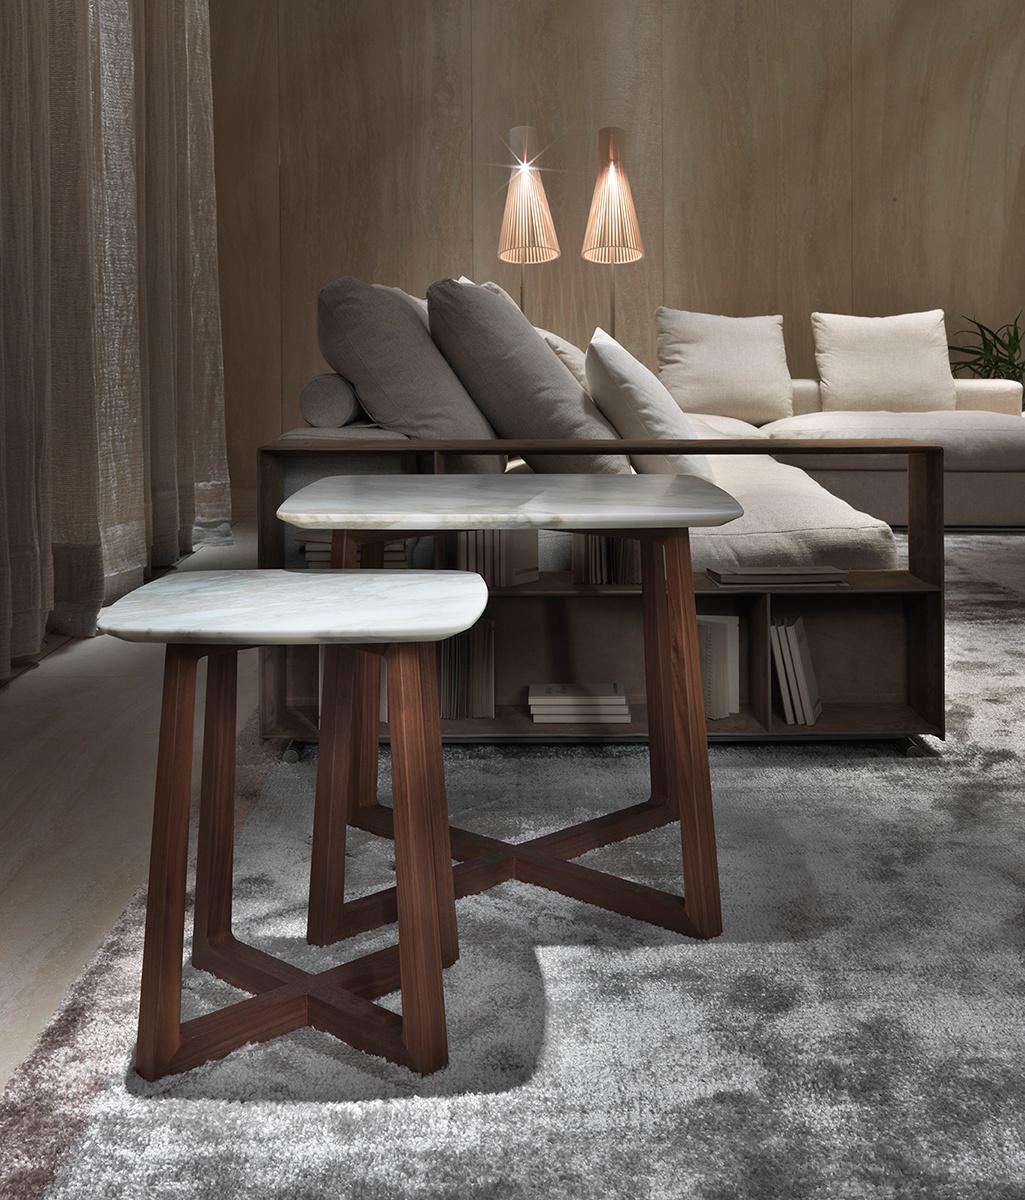 casa tr s chic revista de fim de semana. Black Bedroom Furniture Sets. Home Design Ideas